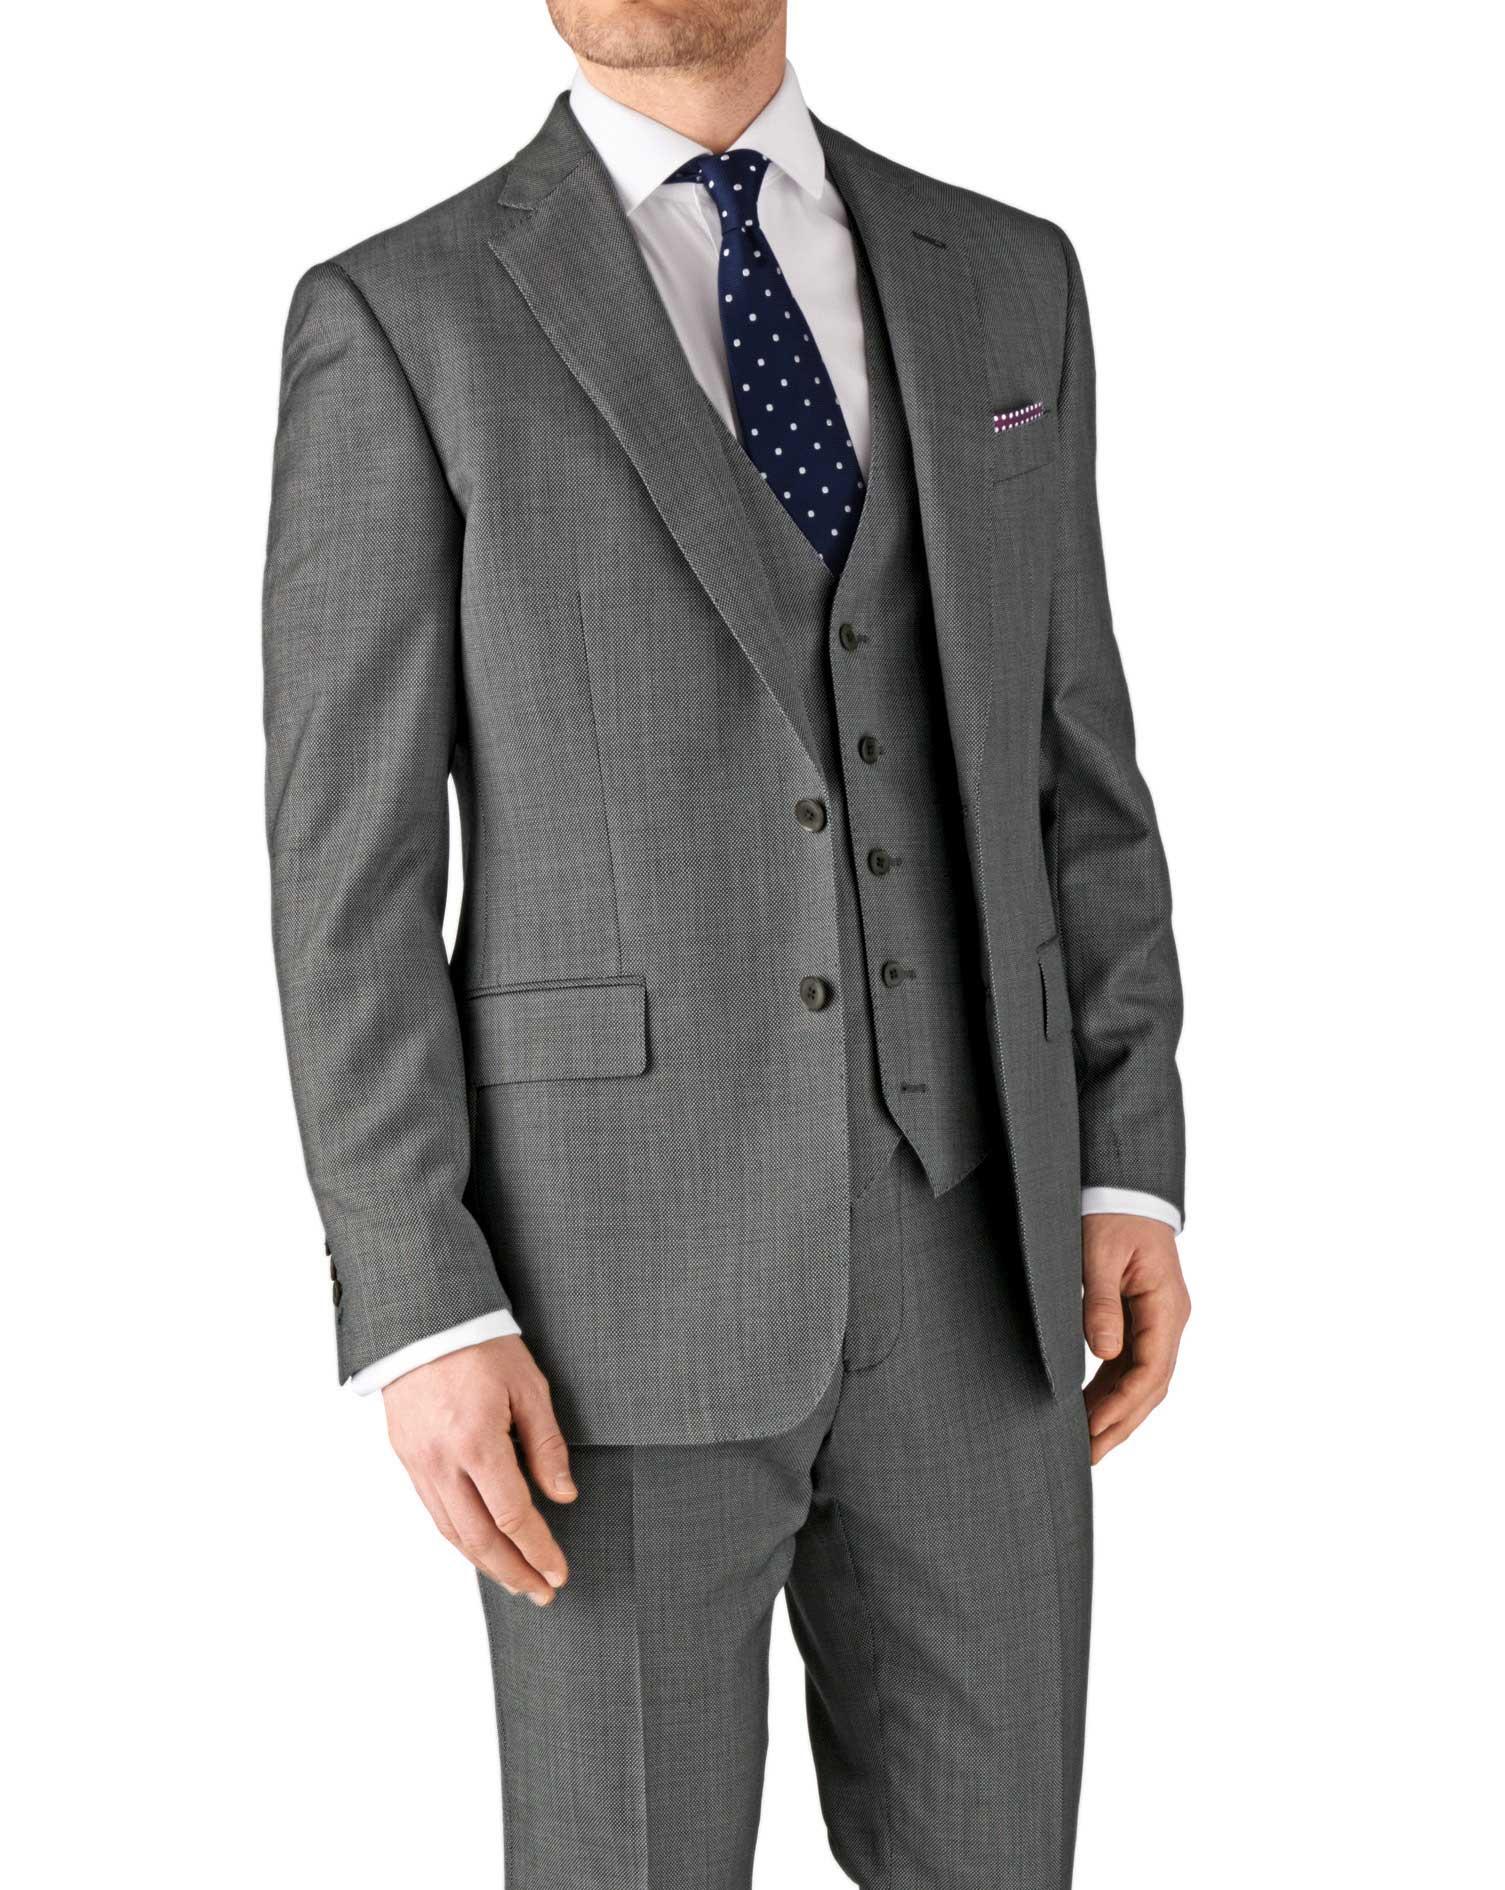 Grey Classic Fit Birdseye Travel Suit Wool Jacket Size 36 Regular by Charles Tyrwhitt